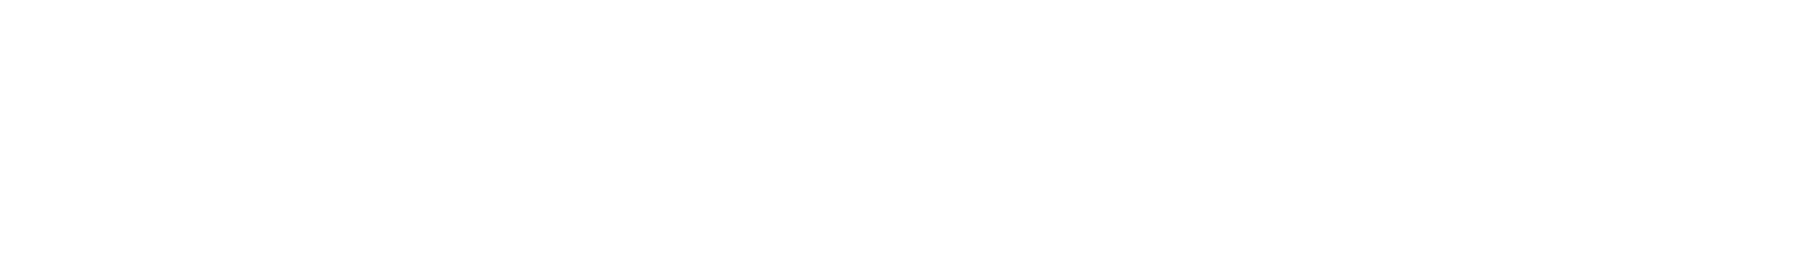 acous guitar 15 e 115